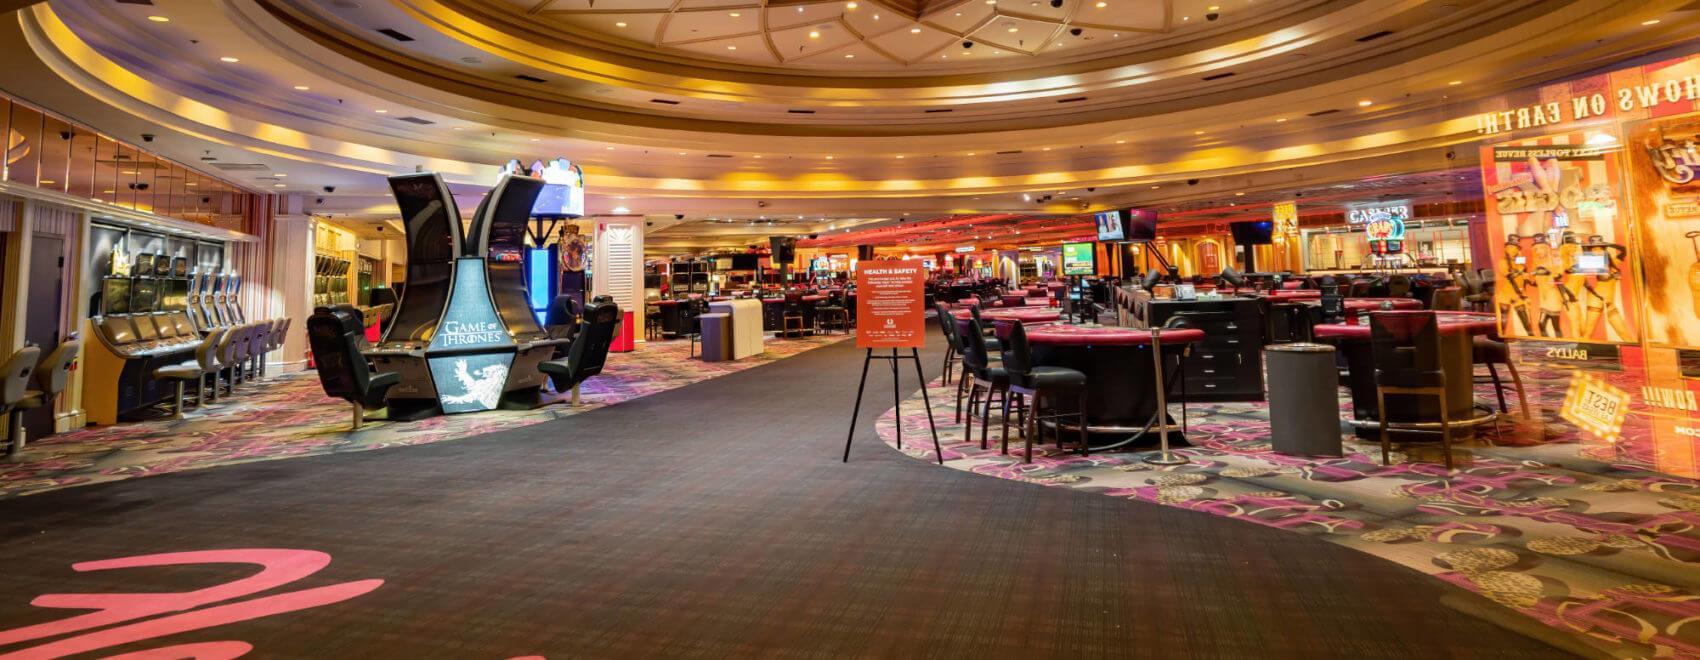 Flamingo Casino Las Vegas tijdends de Coronacrisis